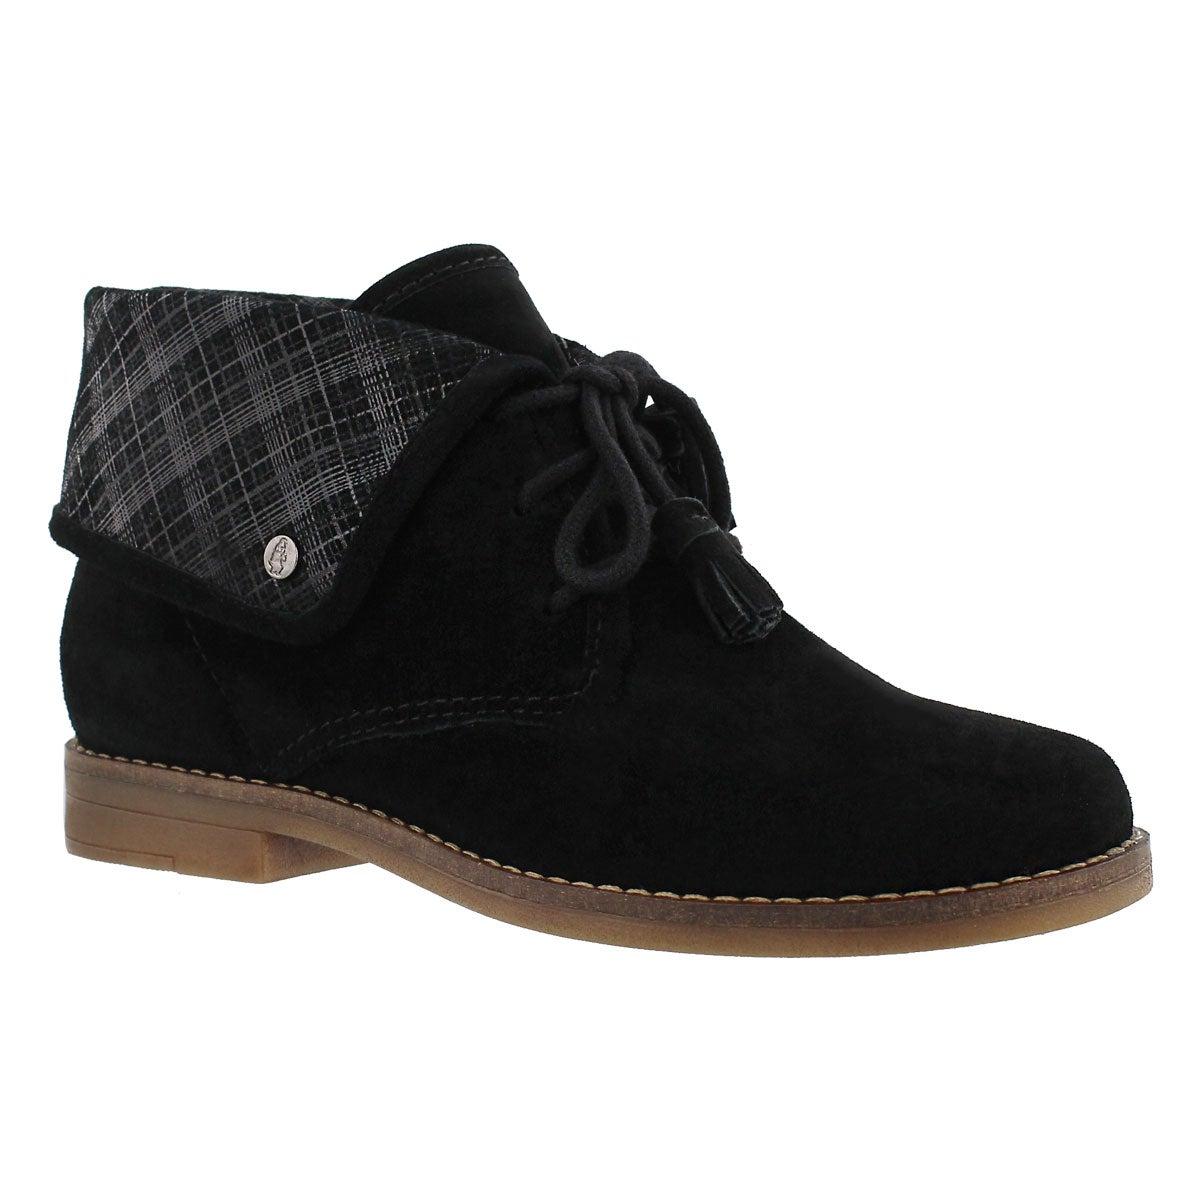 Women's MILOS CAYTO black foldover cuff booties